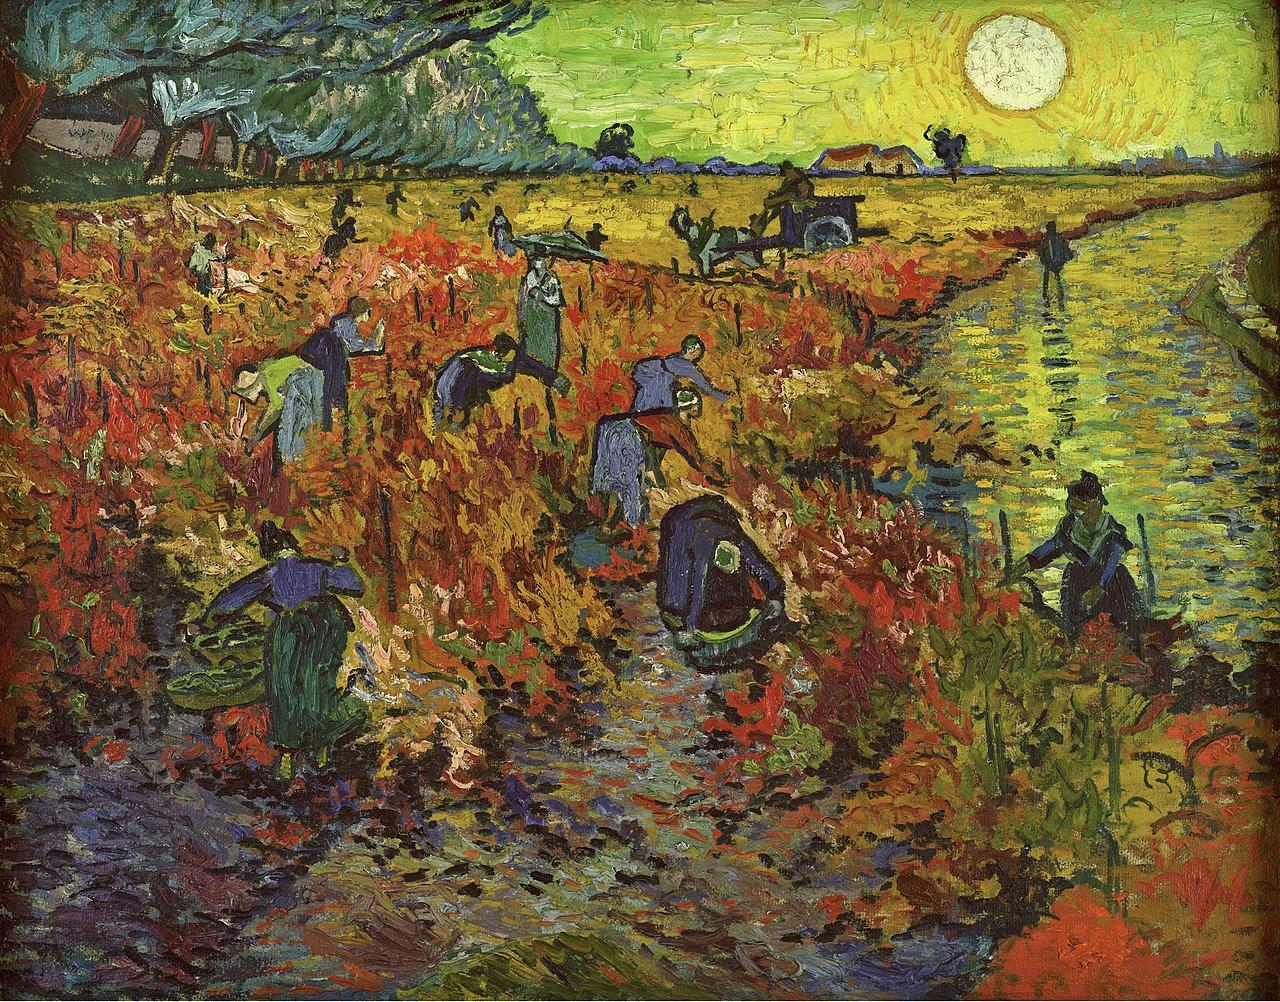 1280px-Vincent_Willem_van_Gogh_036